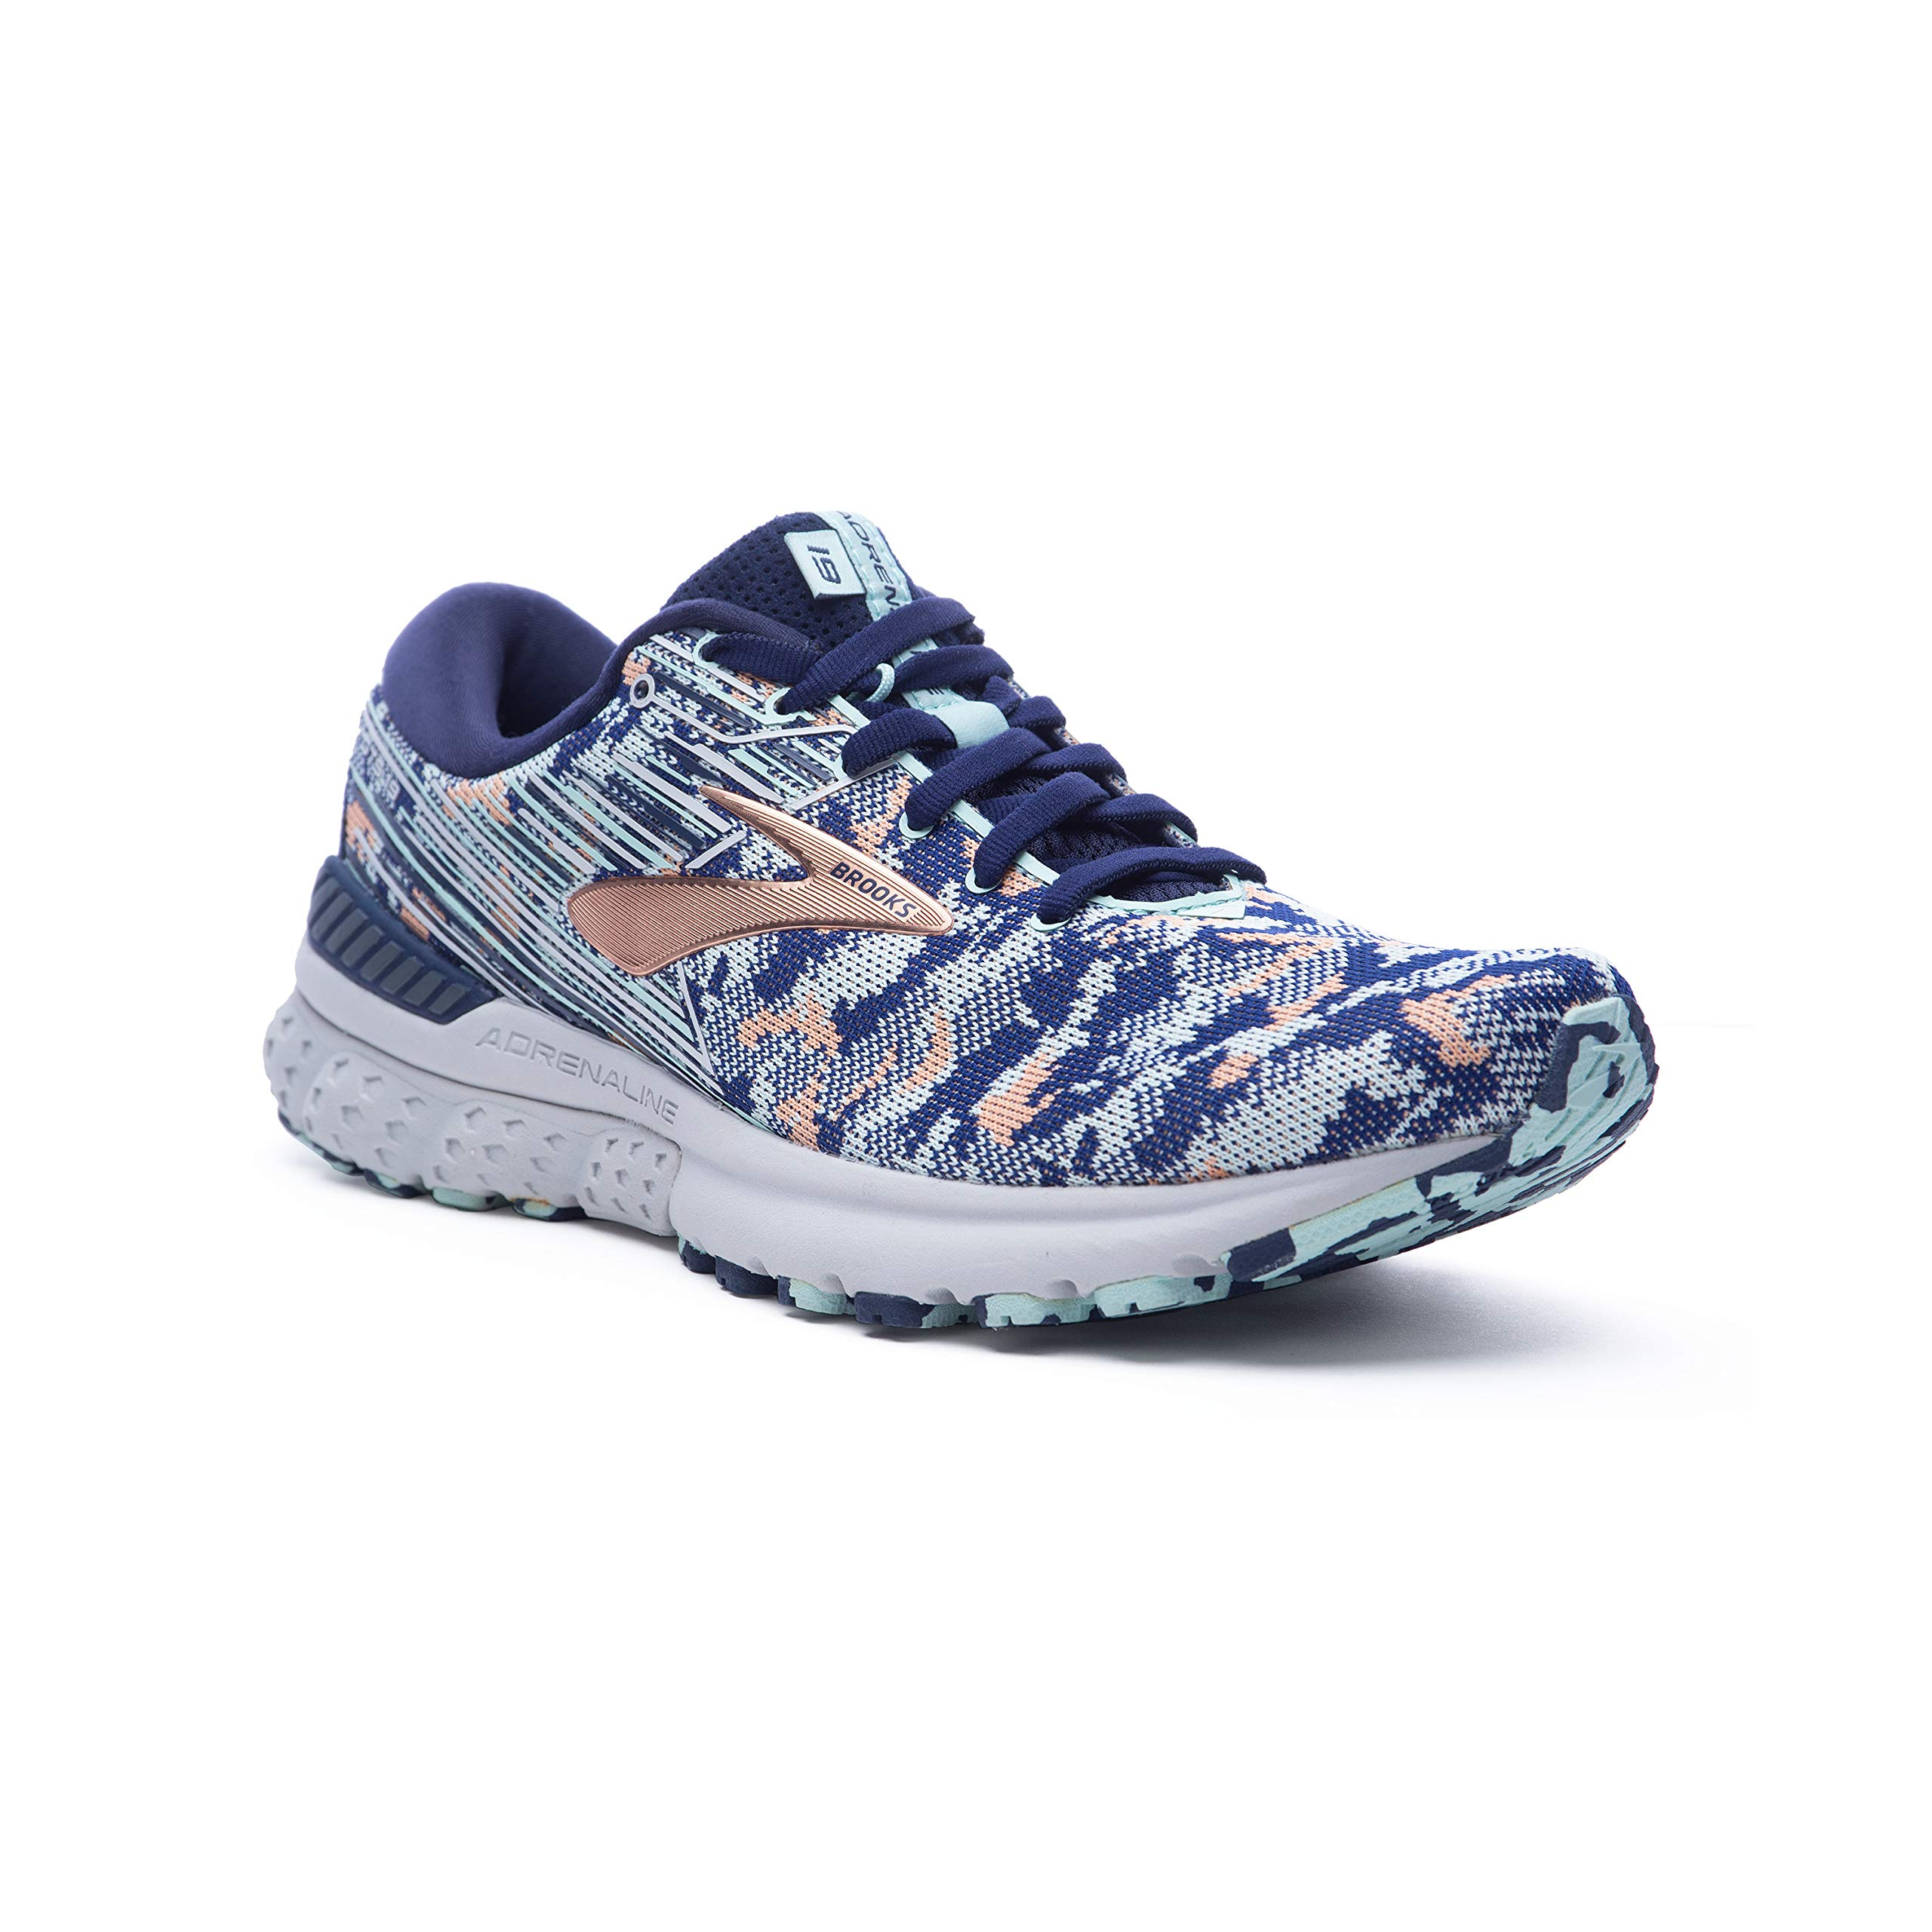 Brooks Womens Adrenaline GTS 19 Running Shoe - Navy/Coral/Ice - B - 12.0 by Brooks